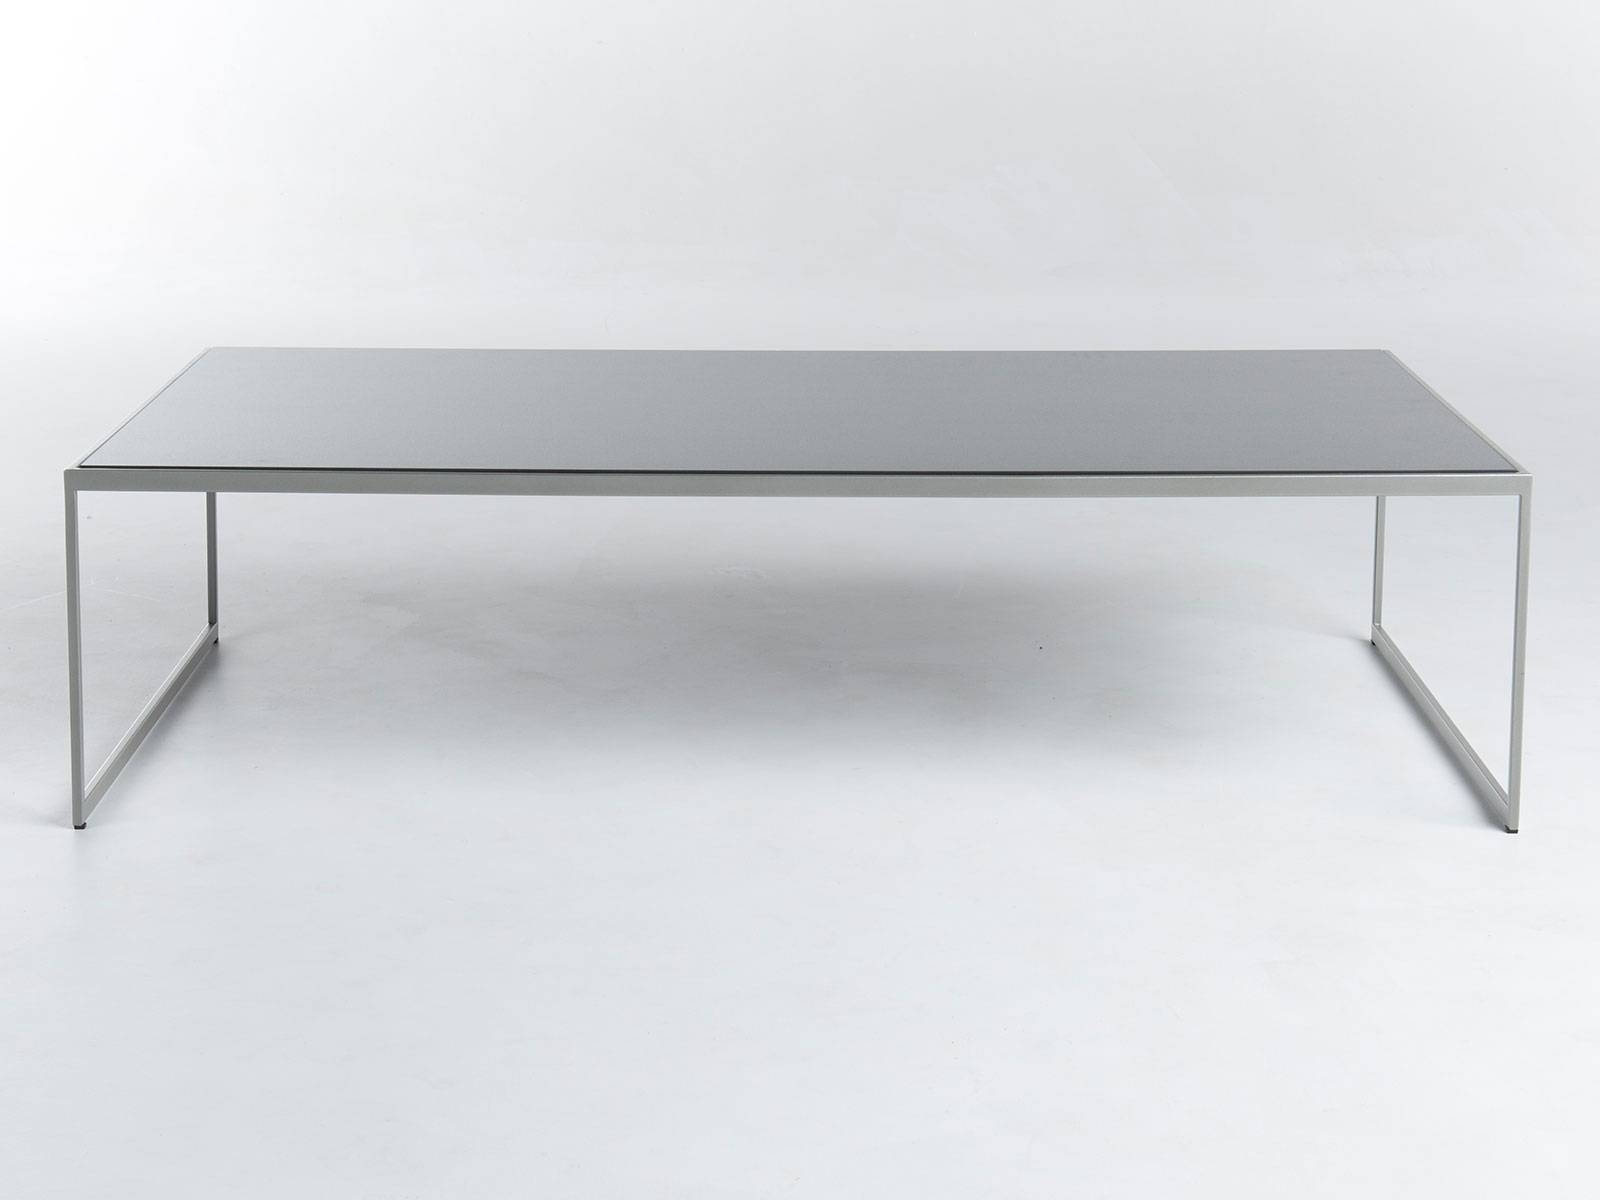 Luna Coffee Table - Bert Plantagie | Live Beautiful regarding Luna Coffee Tables (Image 15 of 30)